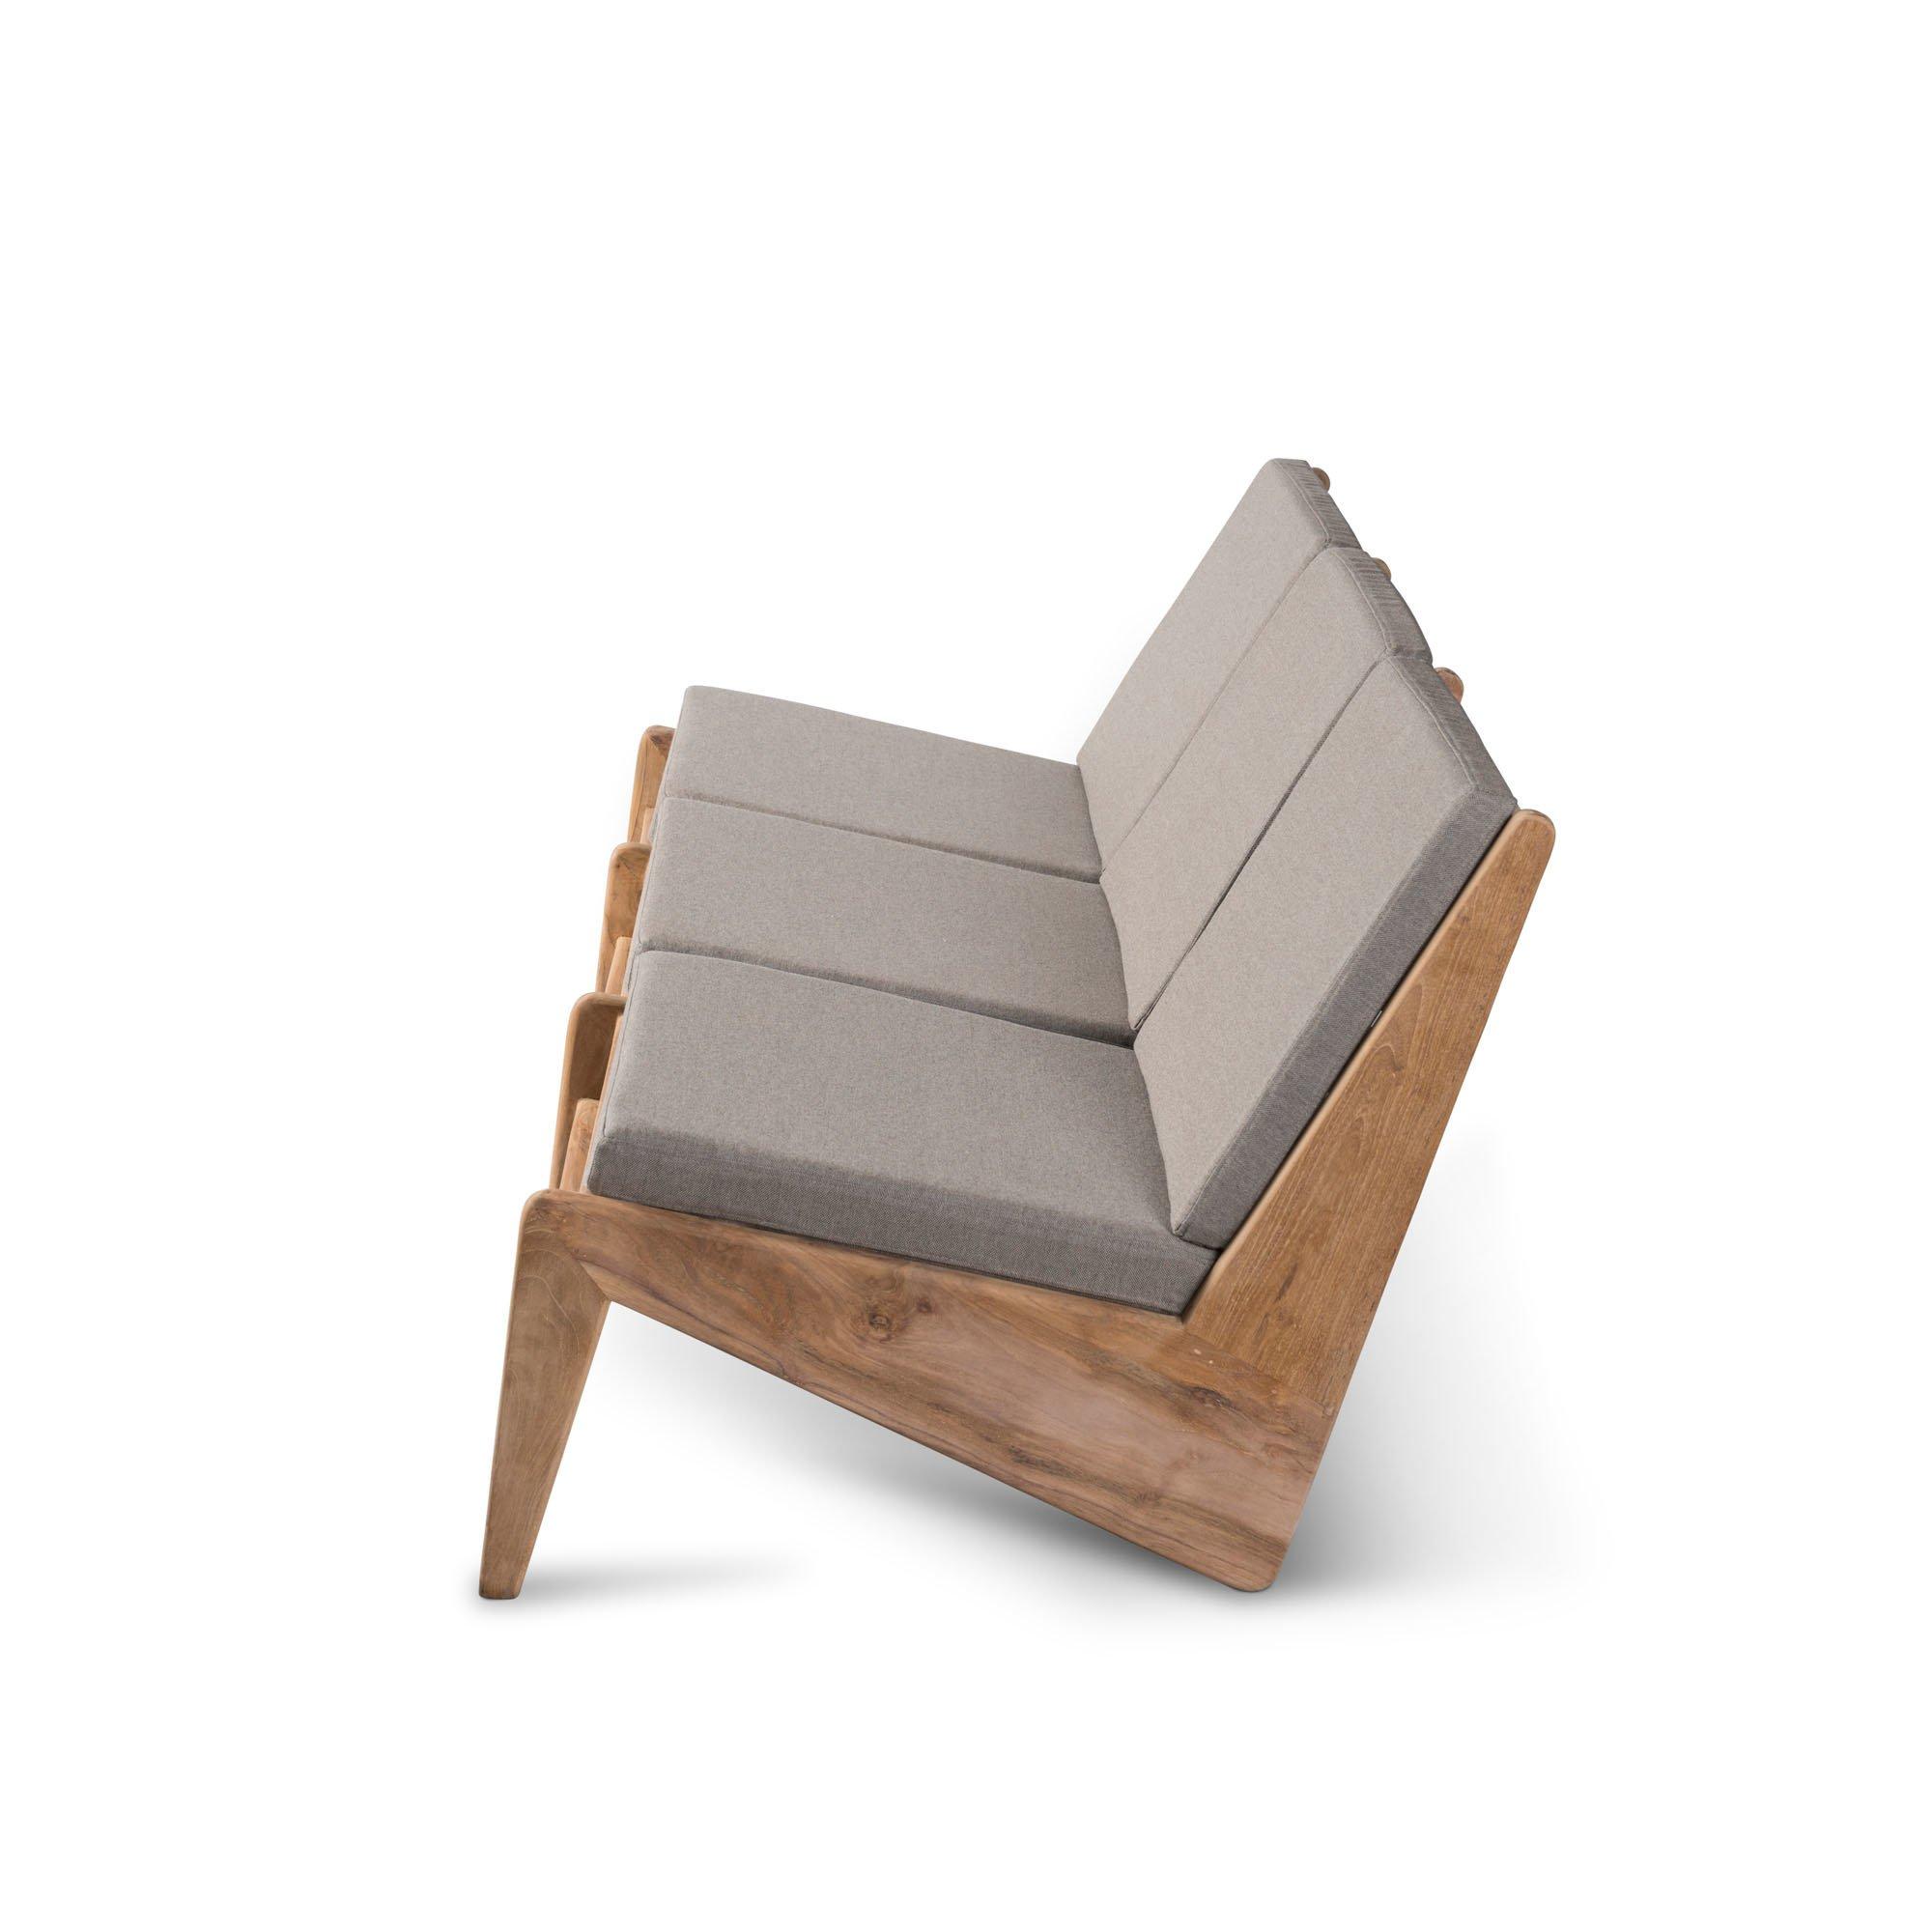 Kangaroo Chair  Bench 3 - Teak Outdoor with Cushion-2